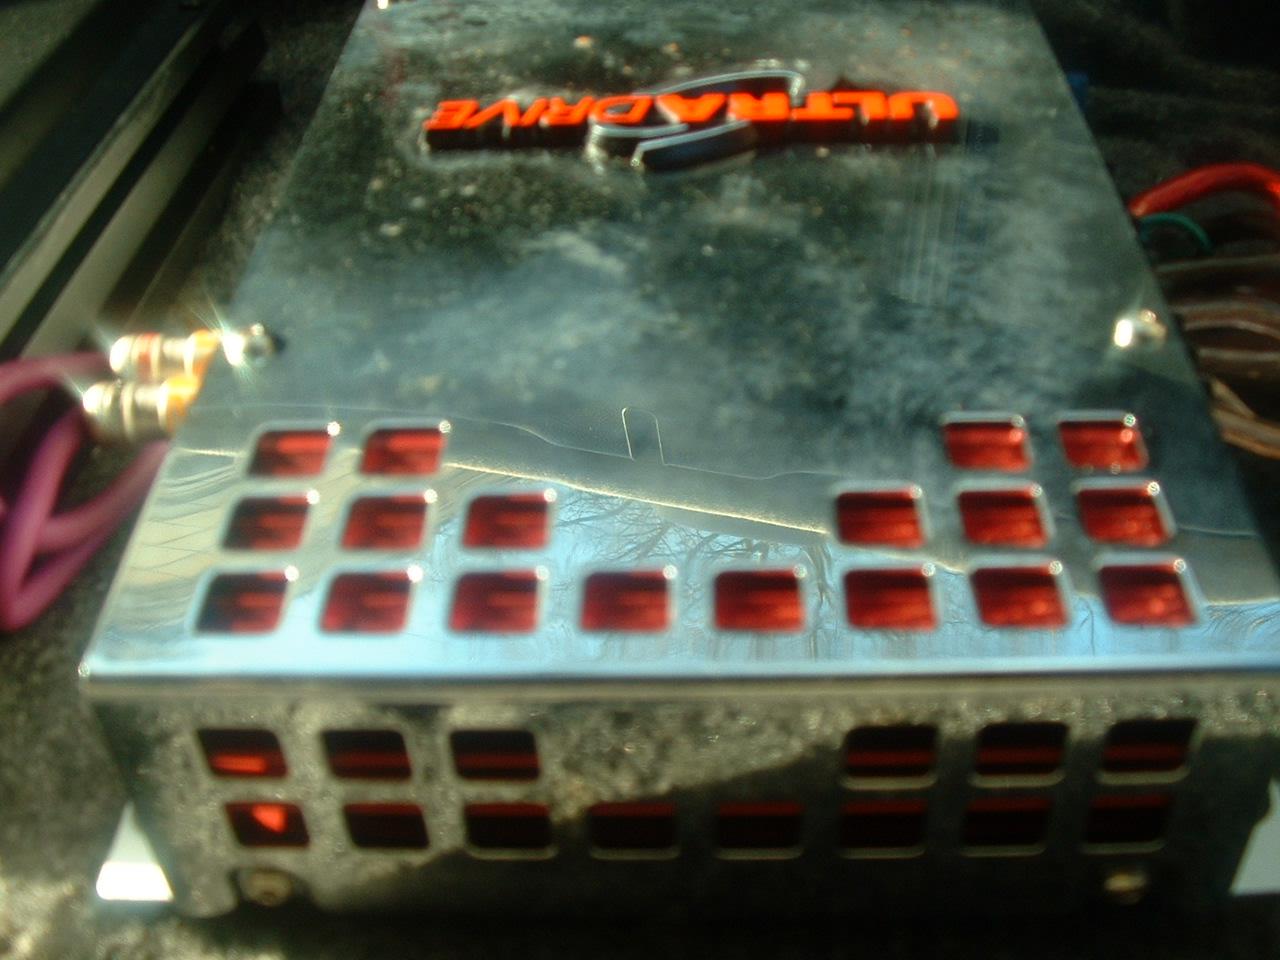 Amp - rear 6x9 power